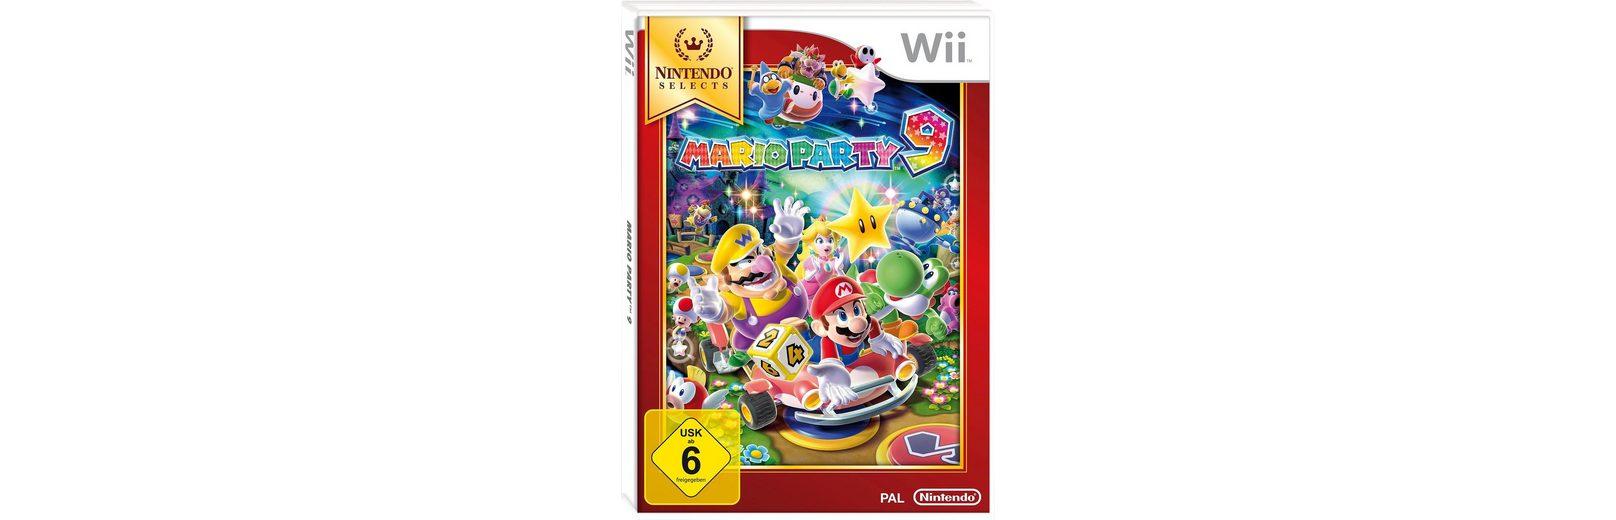 Mario Party 9 Nintendo Selects Wii